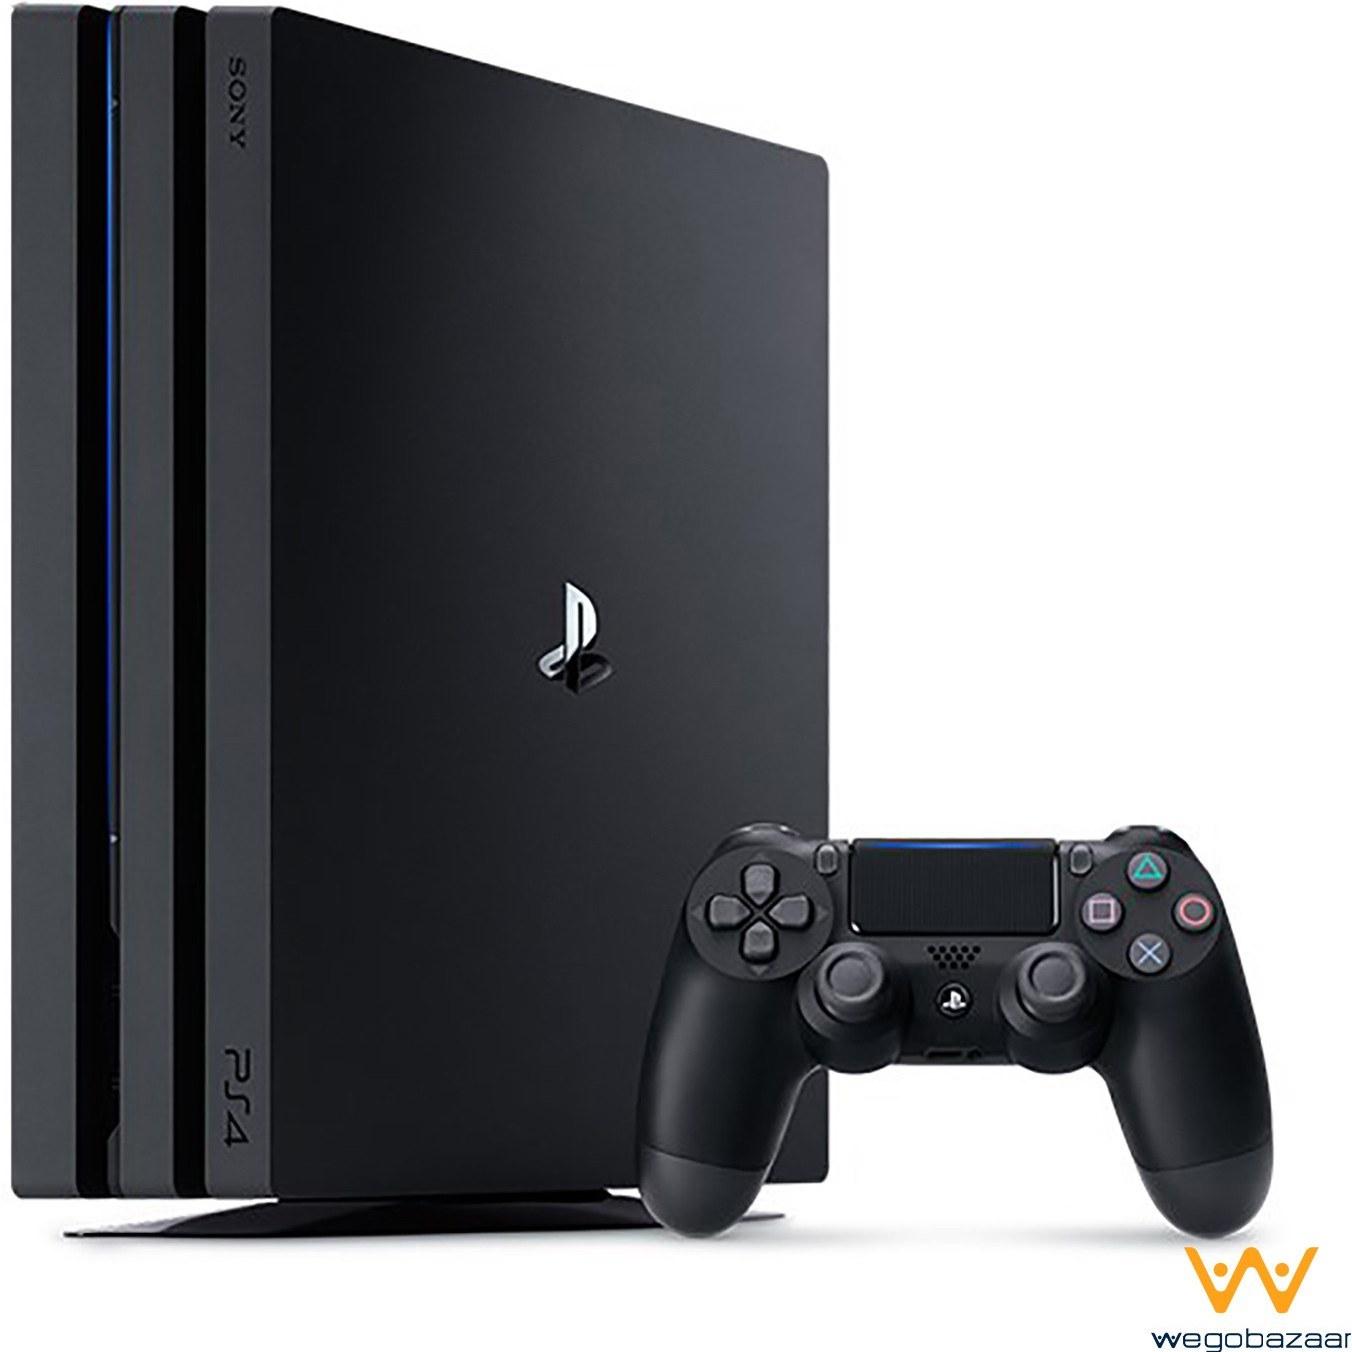 کنسول بازی سونی مدل Playstation 4 pro 7016 - 1TB ریجن-2   Sony Playstation 4 Pro 7016 -1TB Game Console REG-2